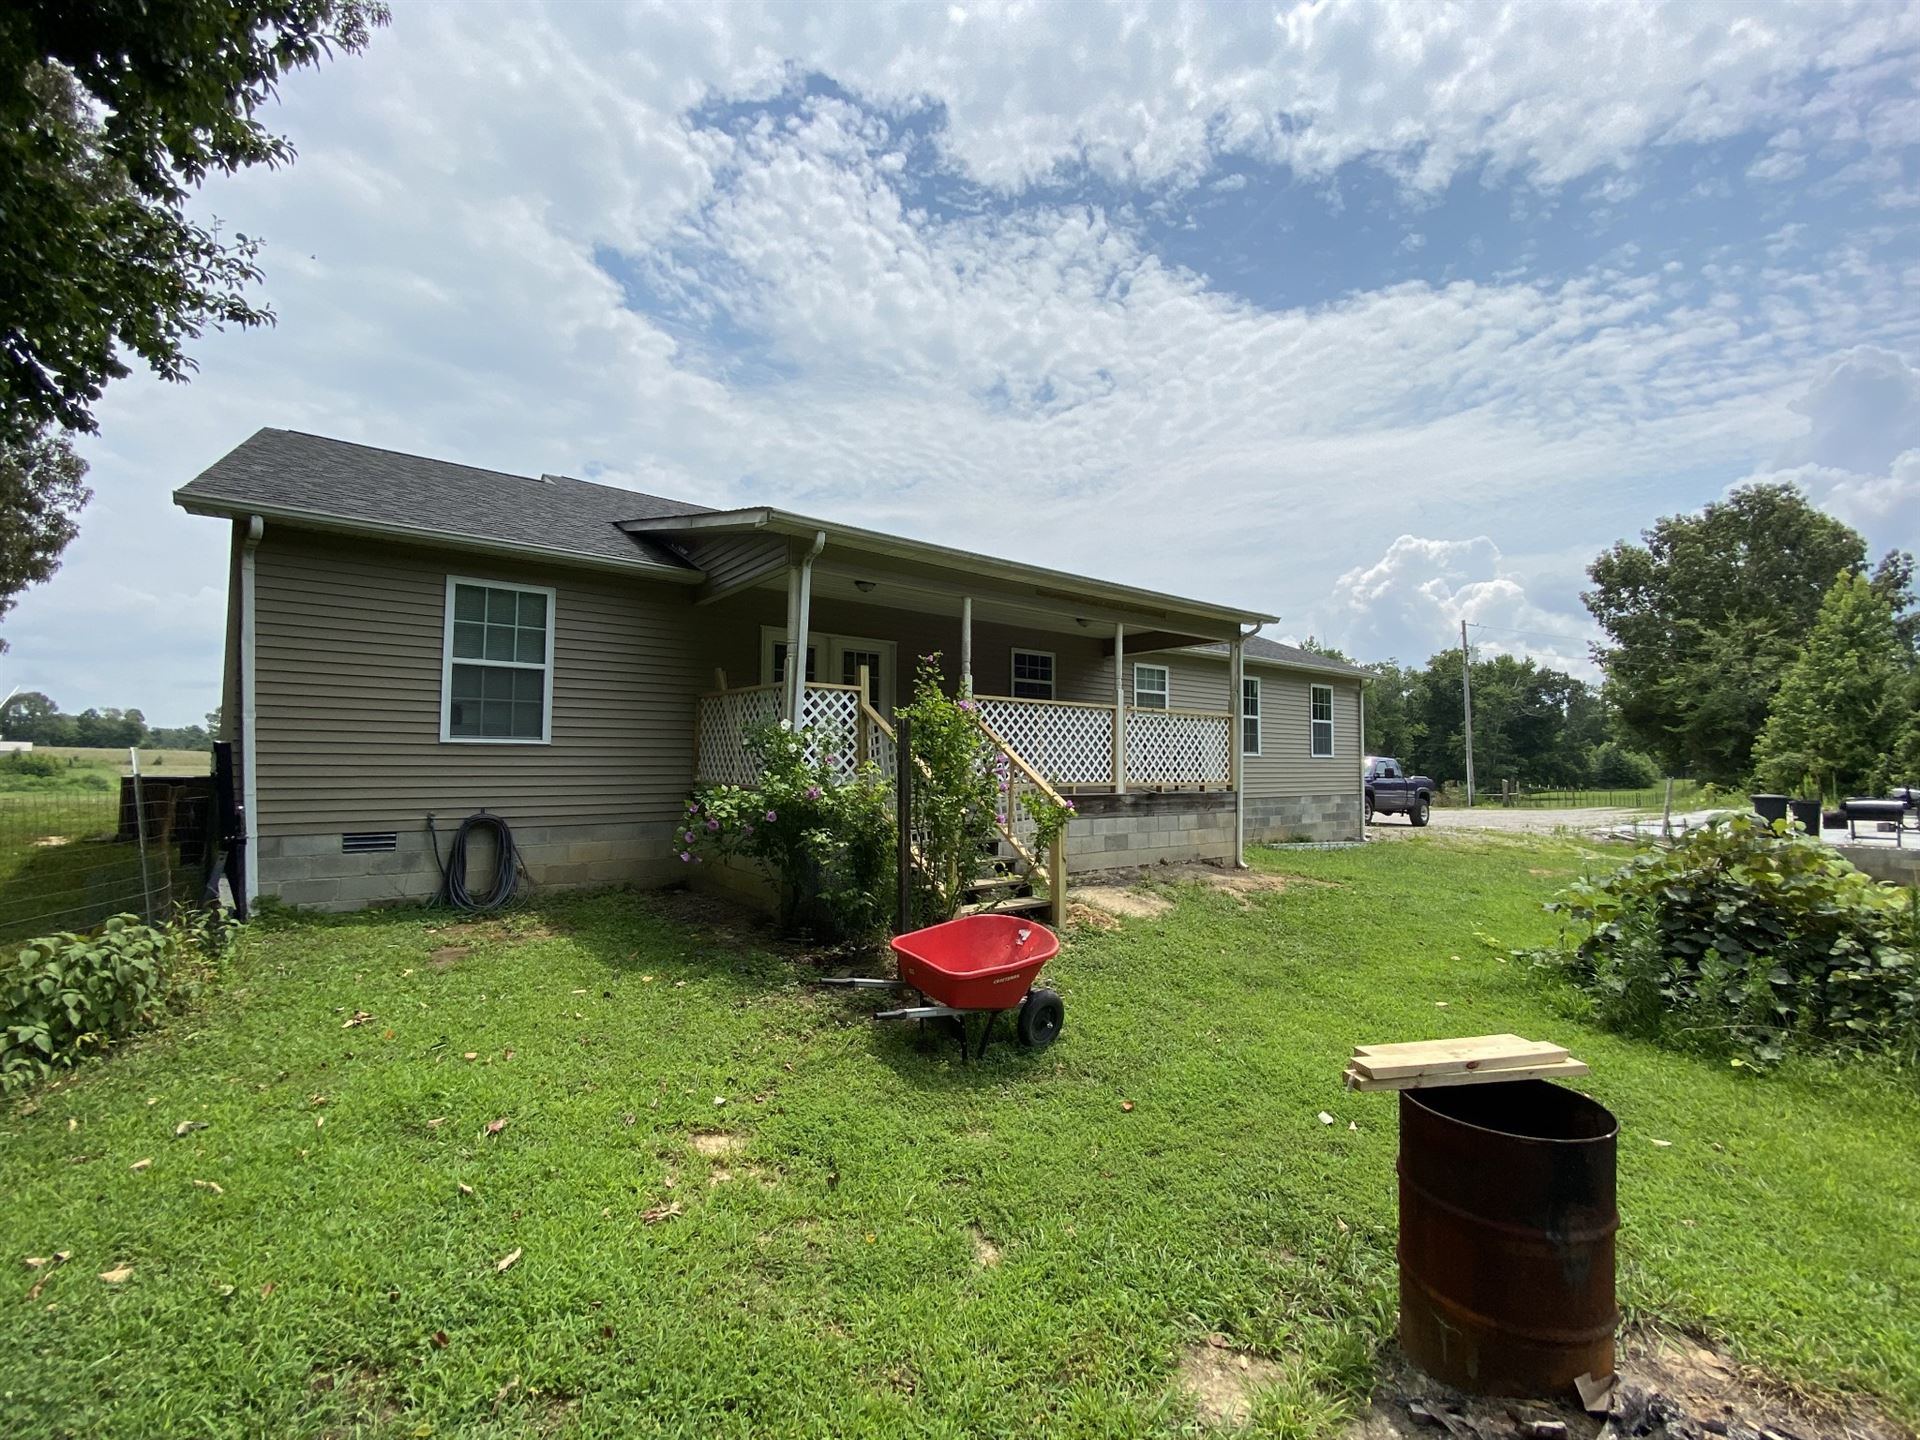 Photo of 182 Grady Pigg Ln, Cookeville, TN 38501 (MLS # 2262905)